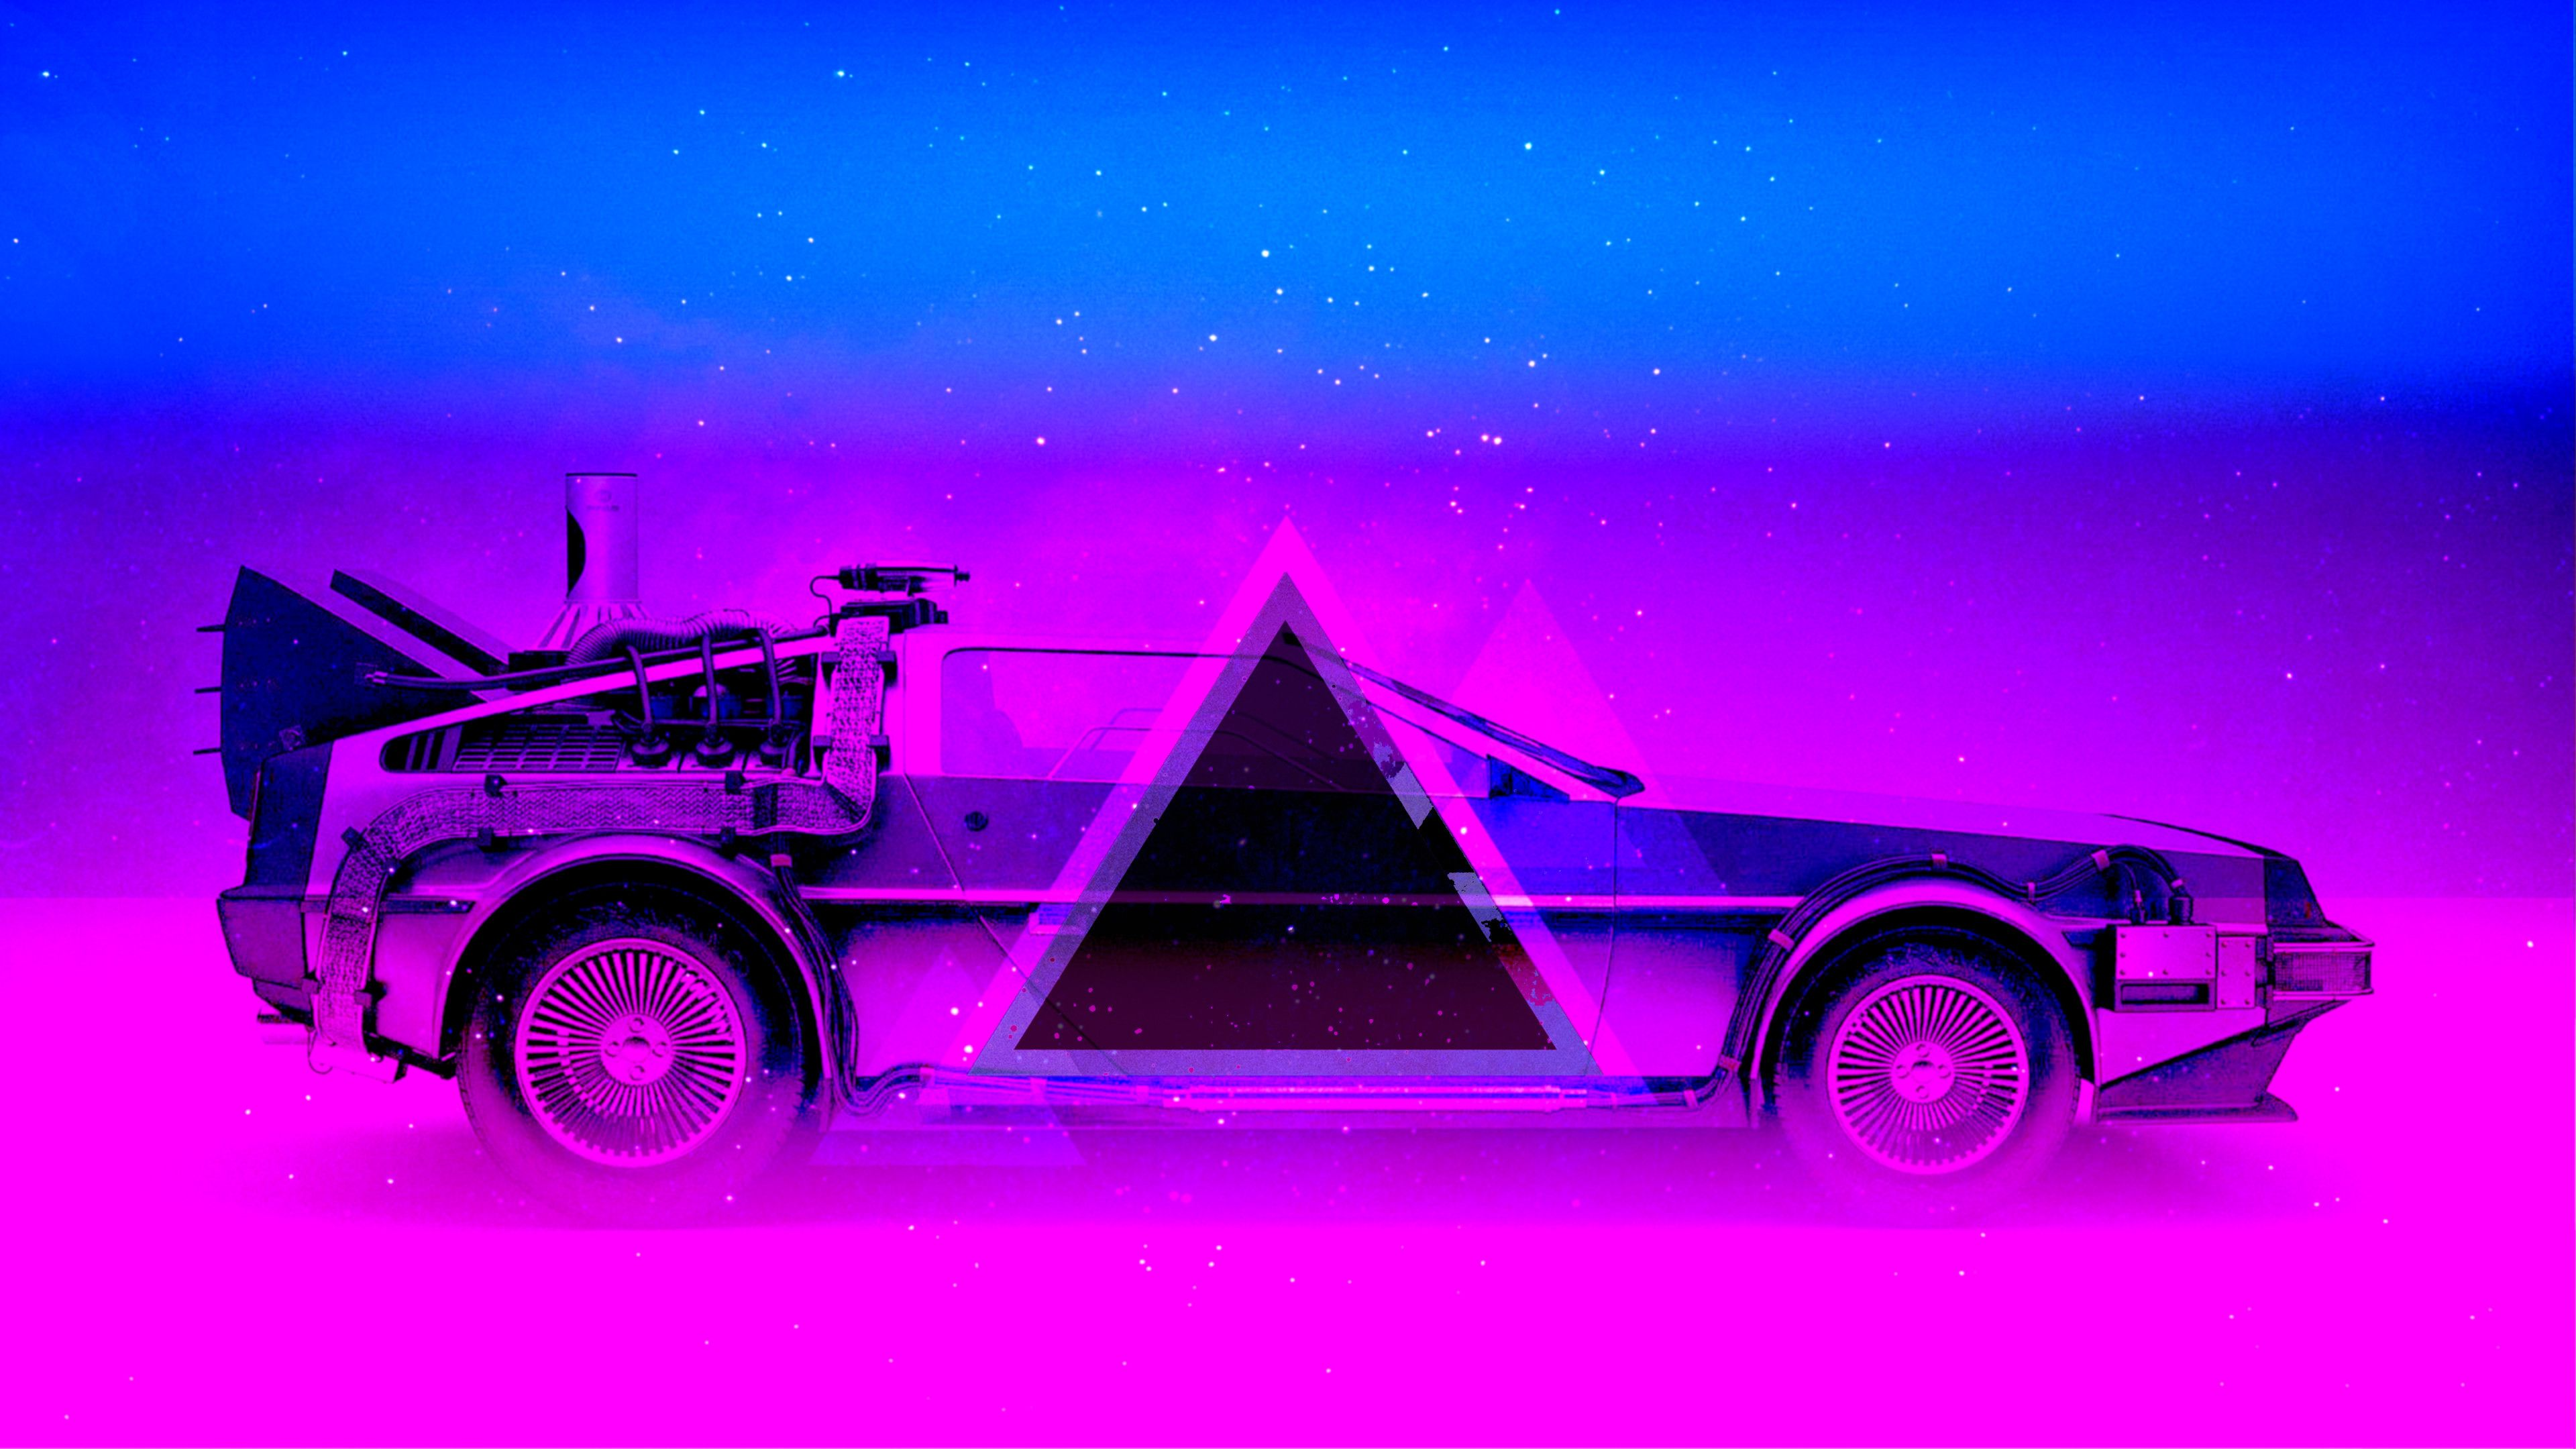 Res 3840x2160 Oshtq Hdtv 80s Car Wallpaper Dmc 12 Synthe